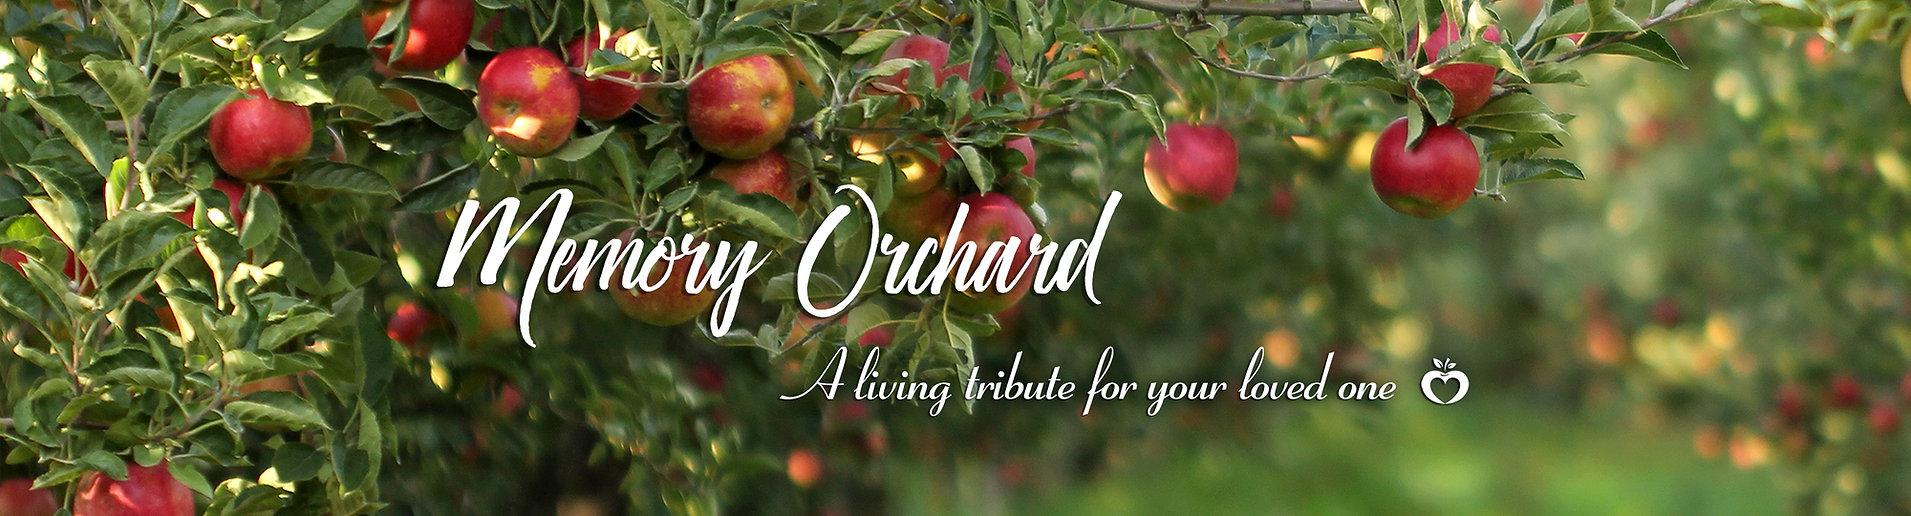 memory orchard banner landscape b.jpg